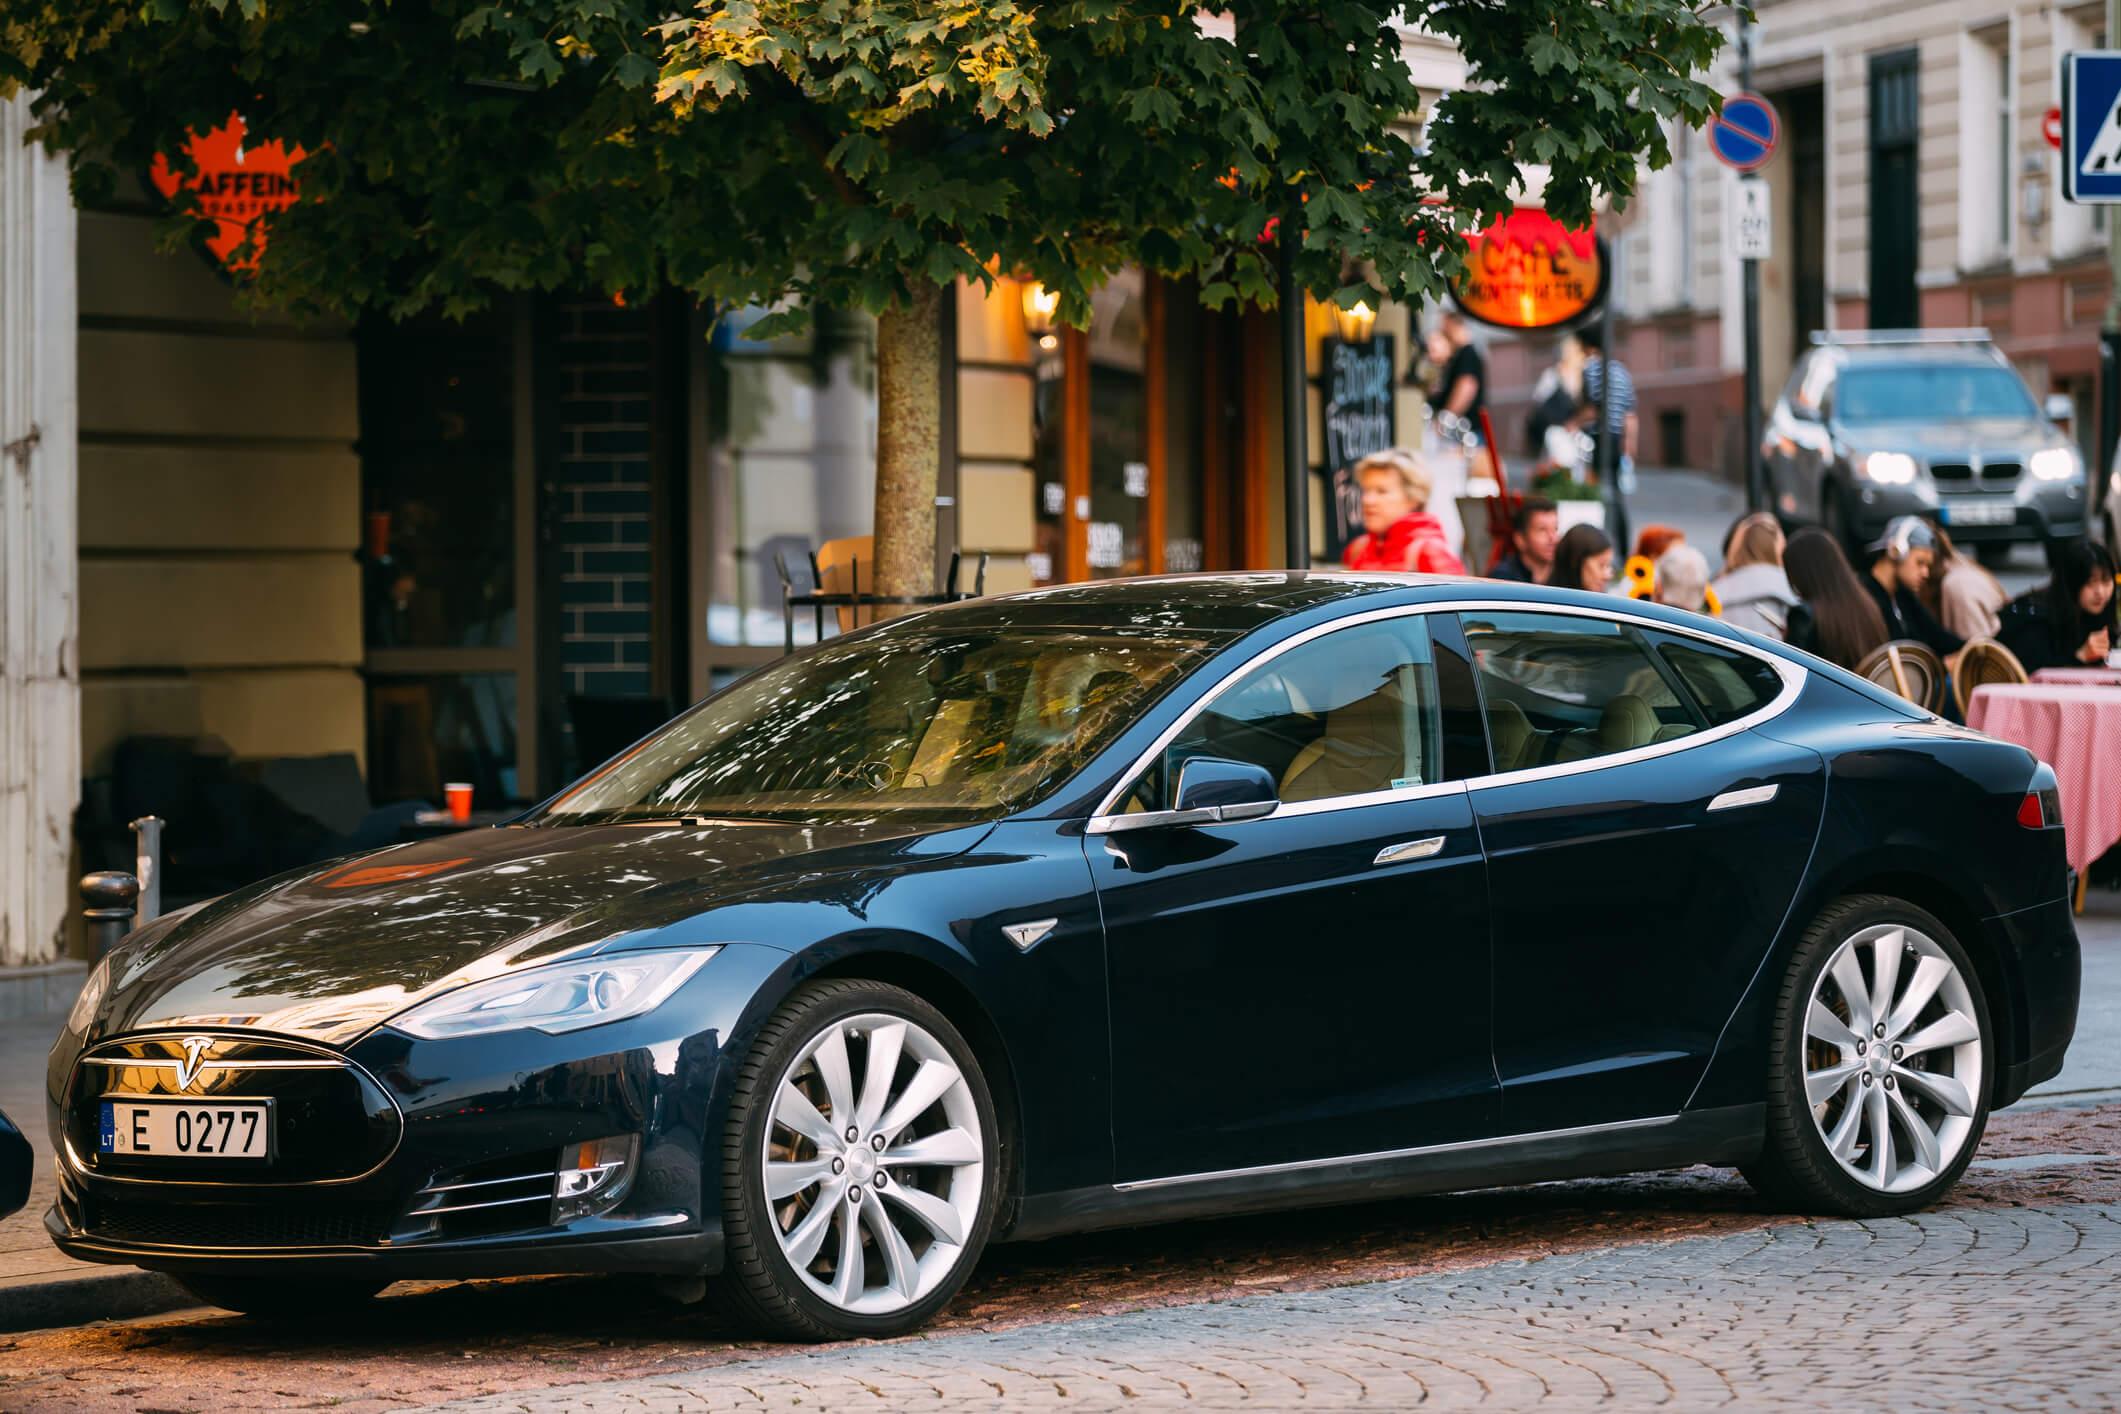 Older Tesla Model S battery lifespan